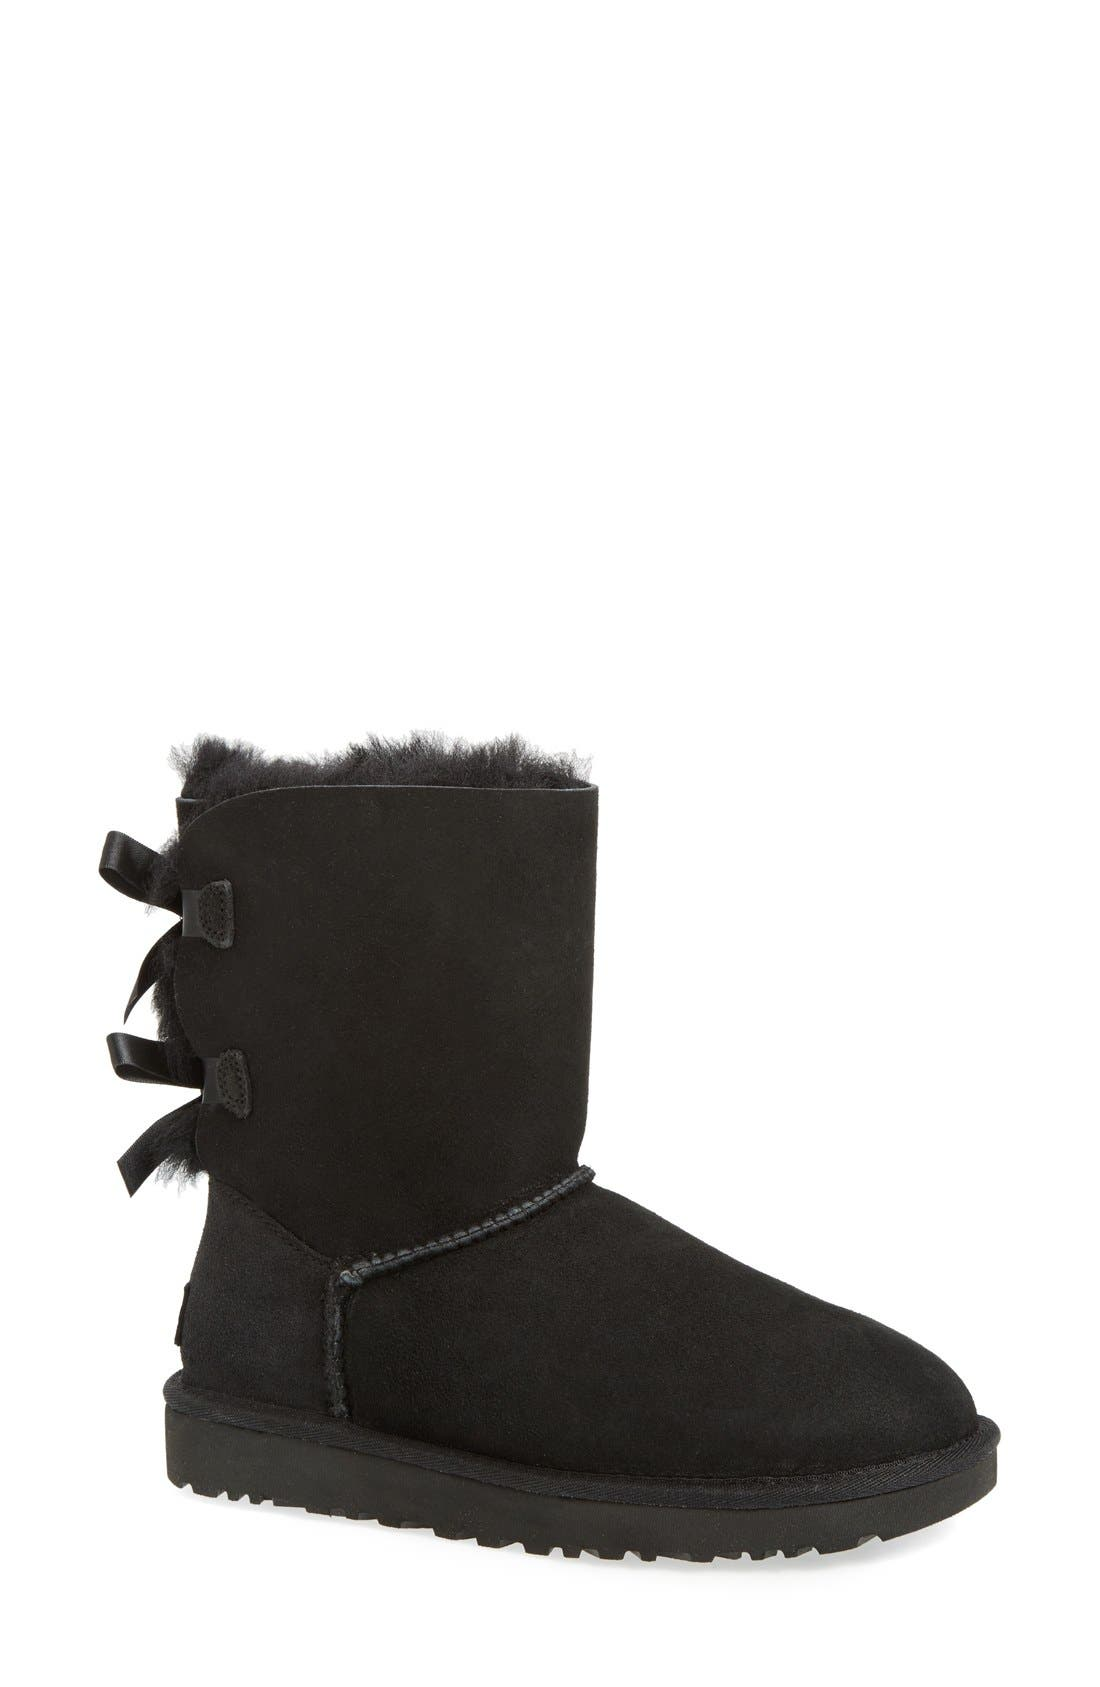 'Bailey Bow II' Boot,                         Main,                         color, Black Suede